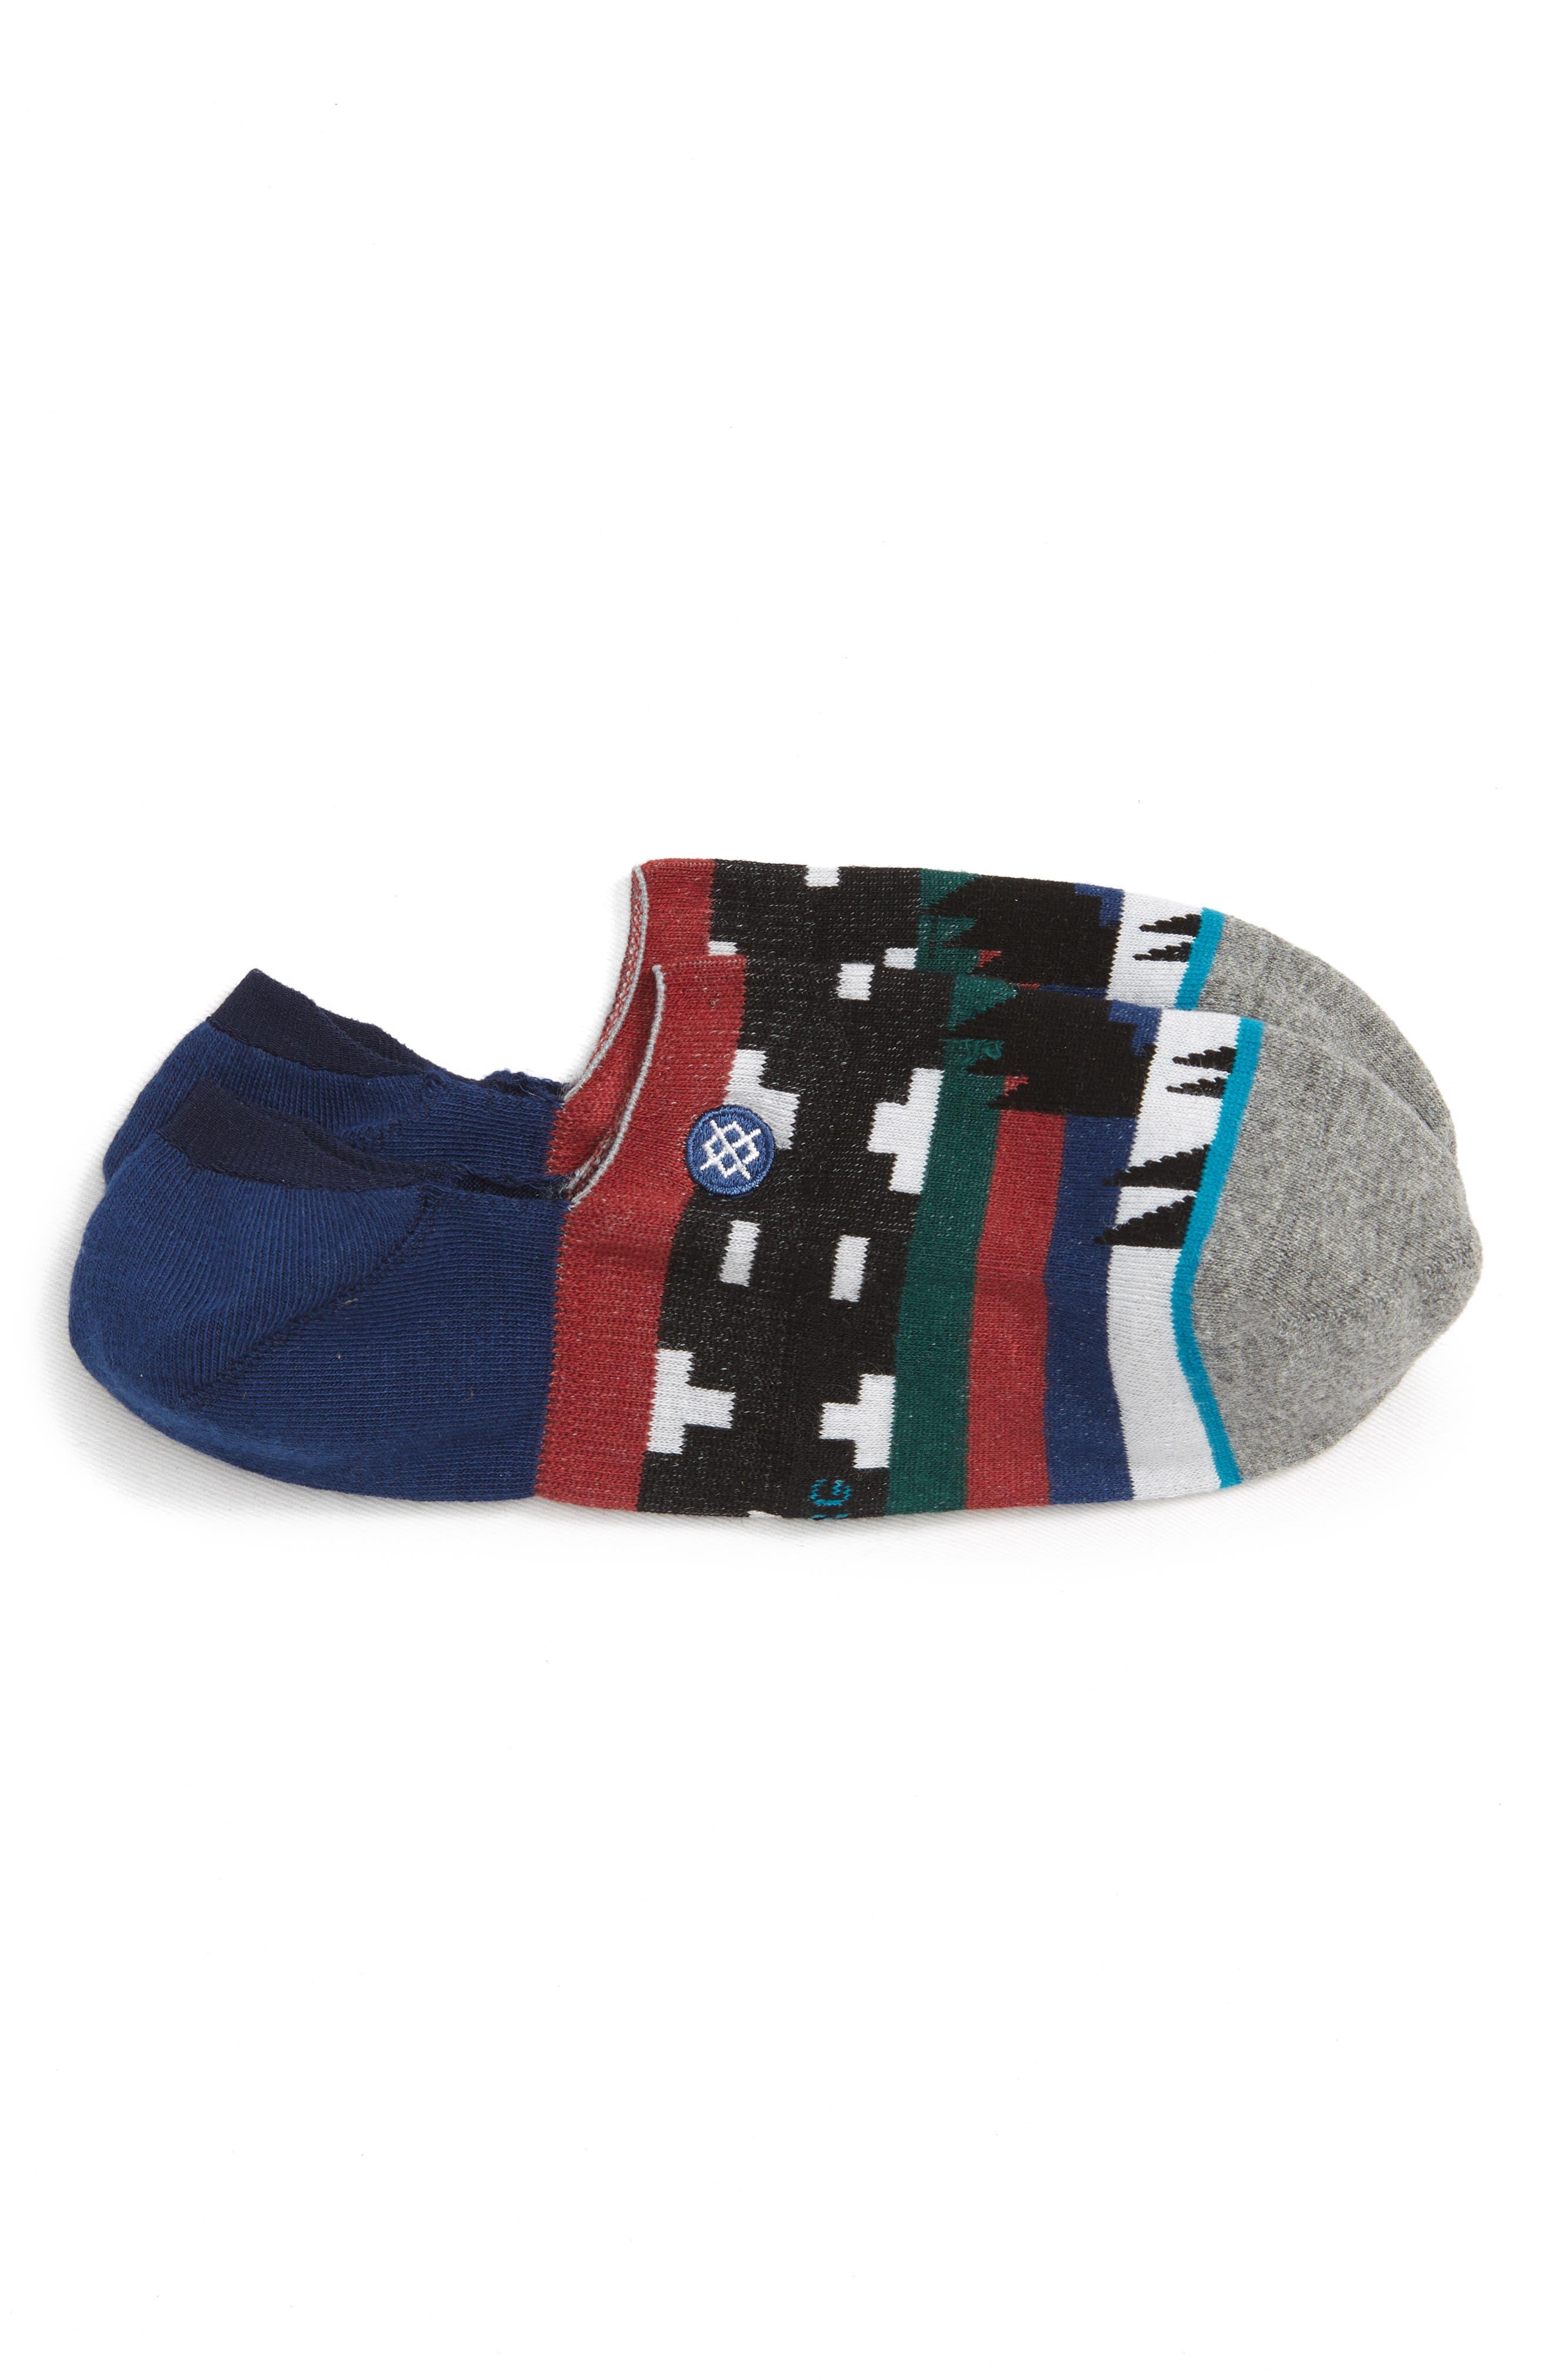 Waziatta Low Socks,                             Main thumbnail 1, color,                             NAVY